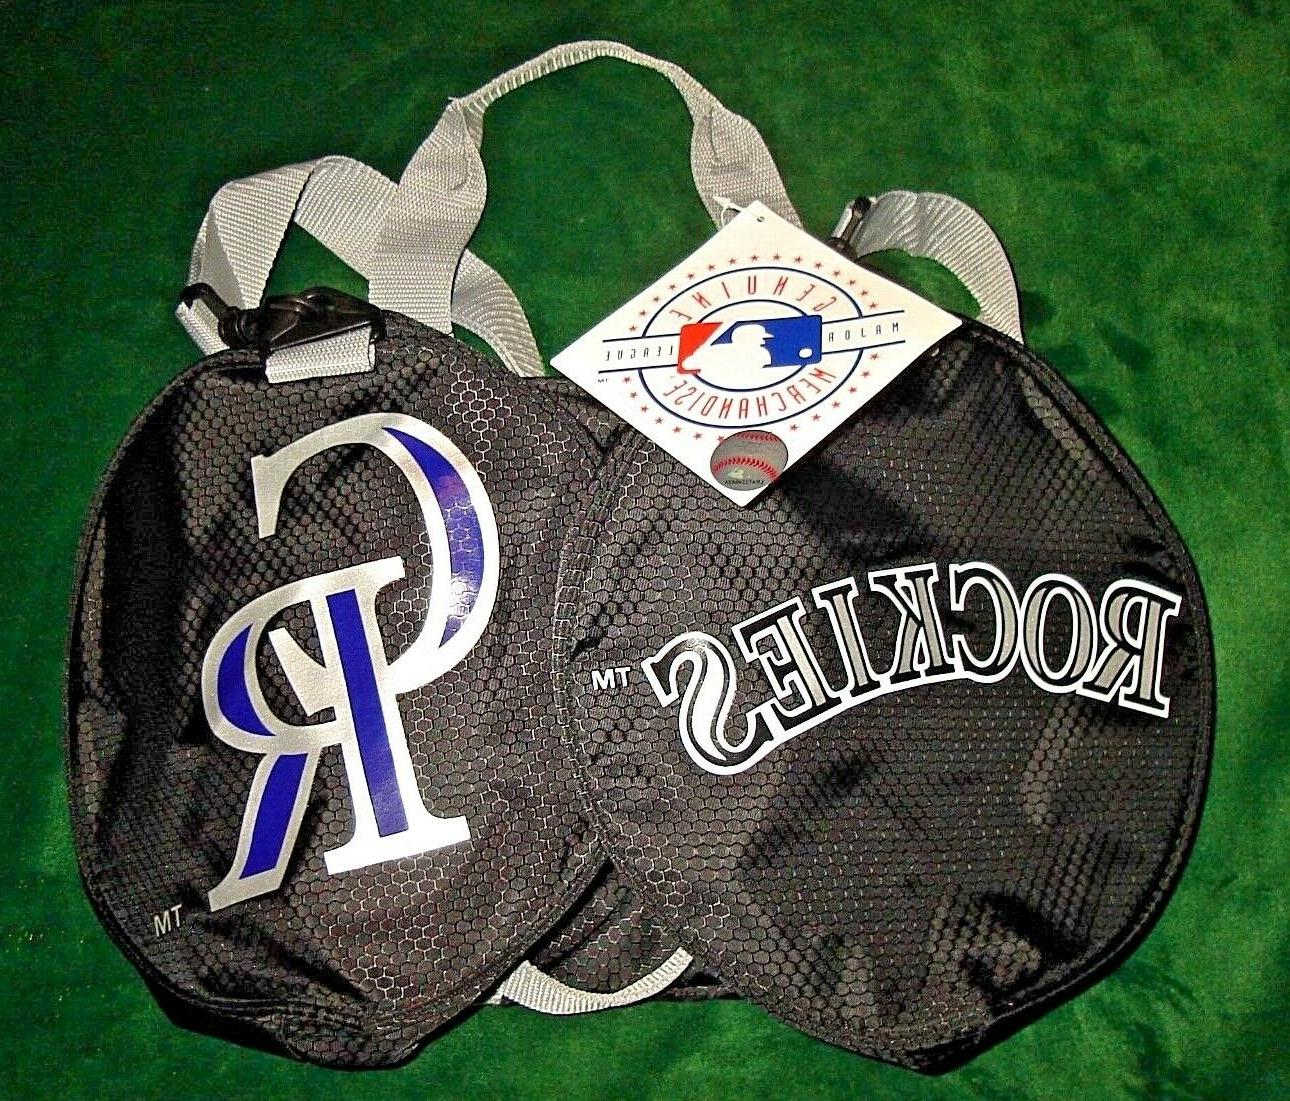 brand new colorado rockies equipment bag backpack